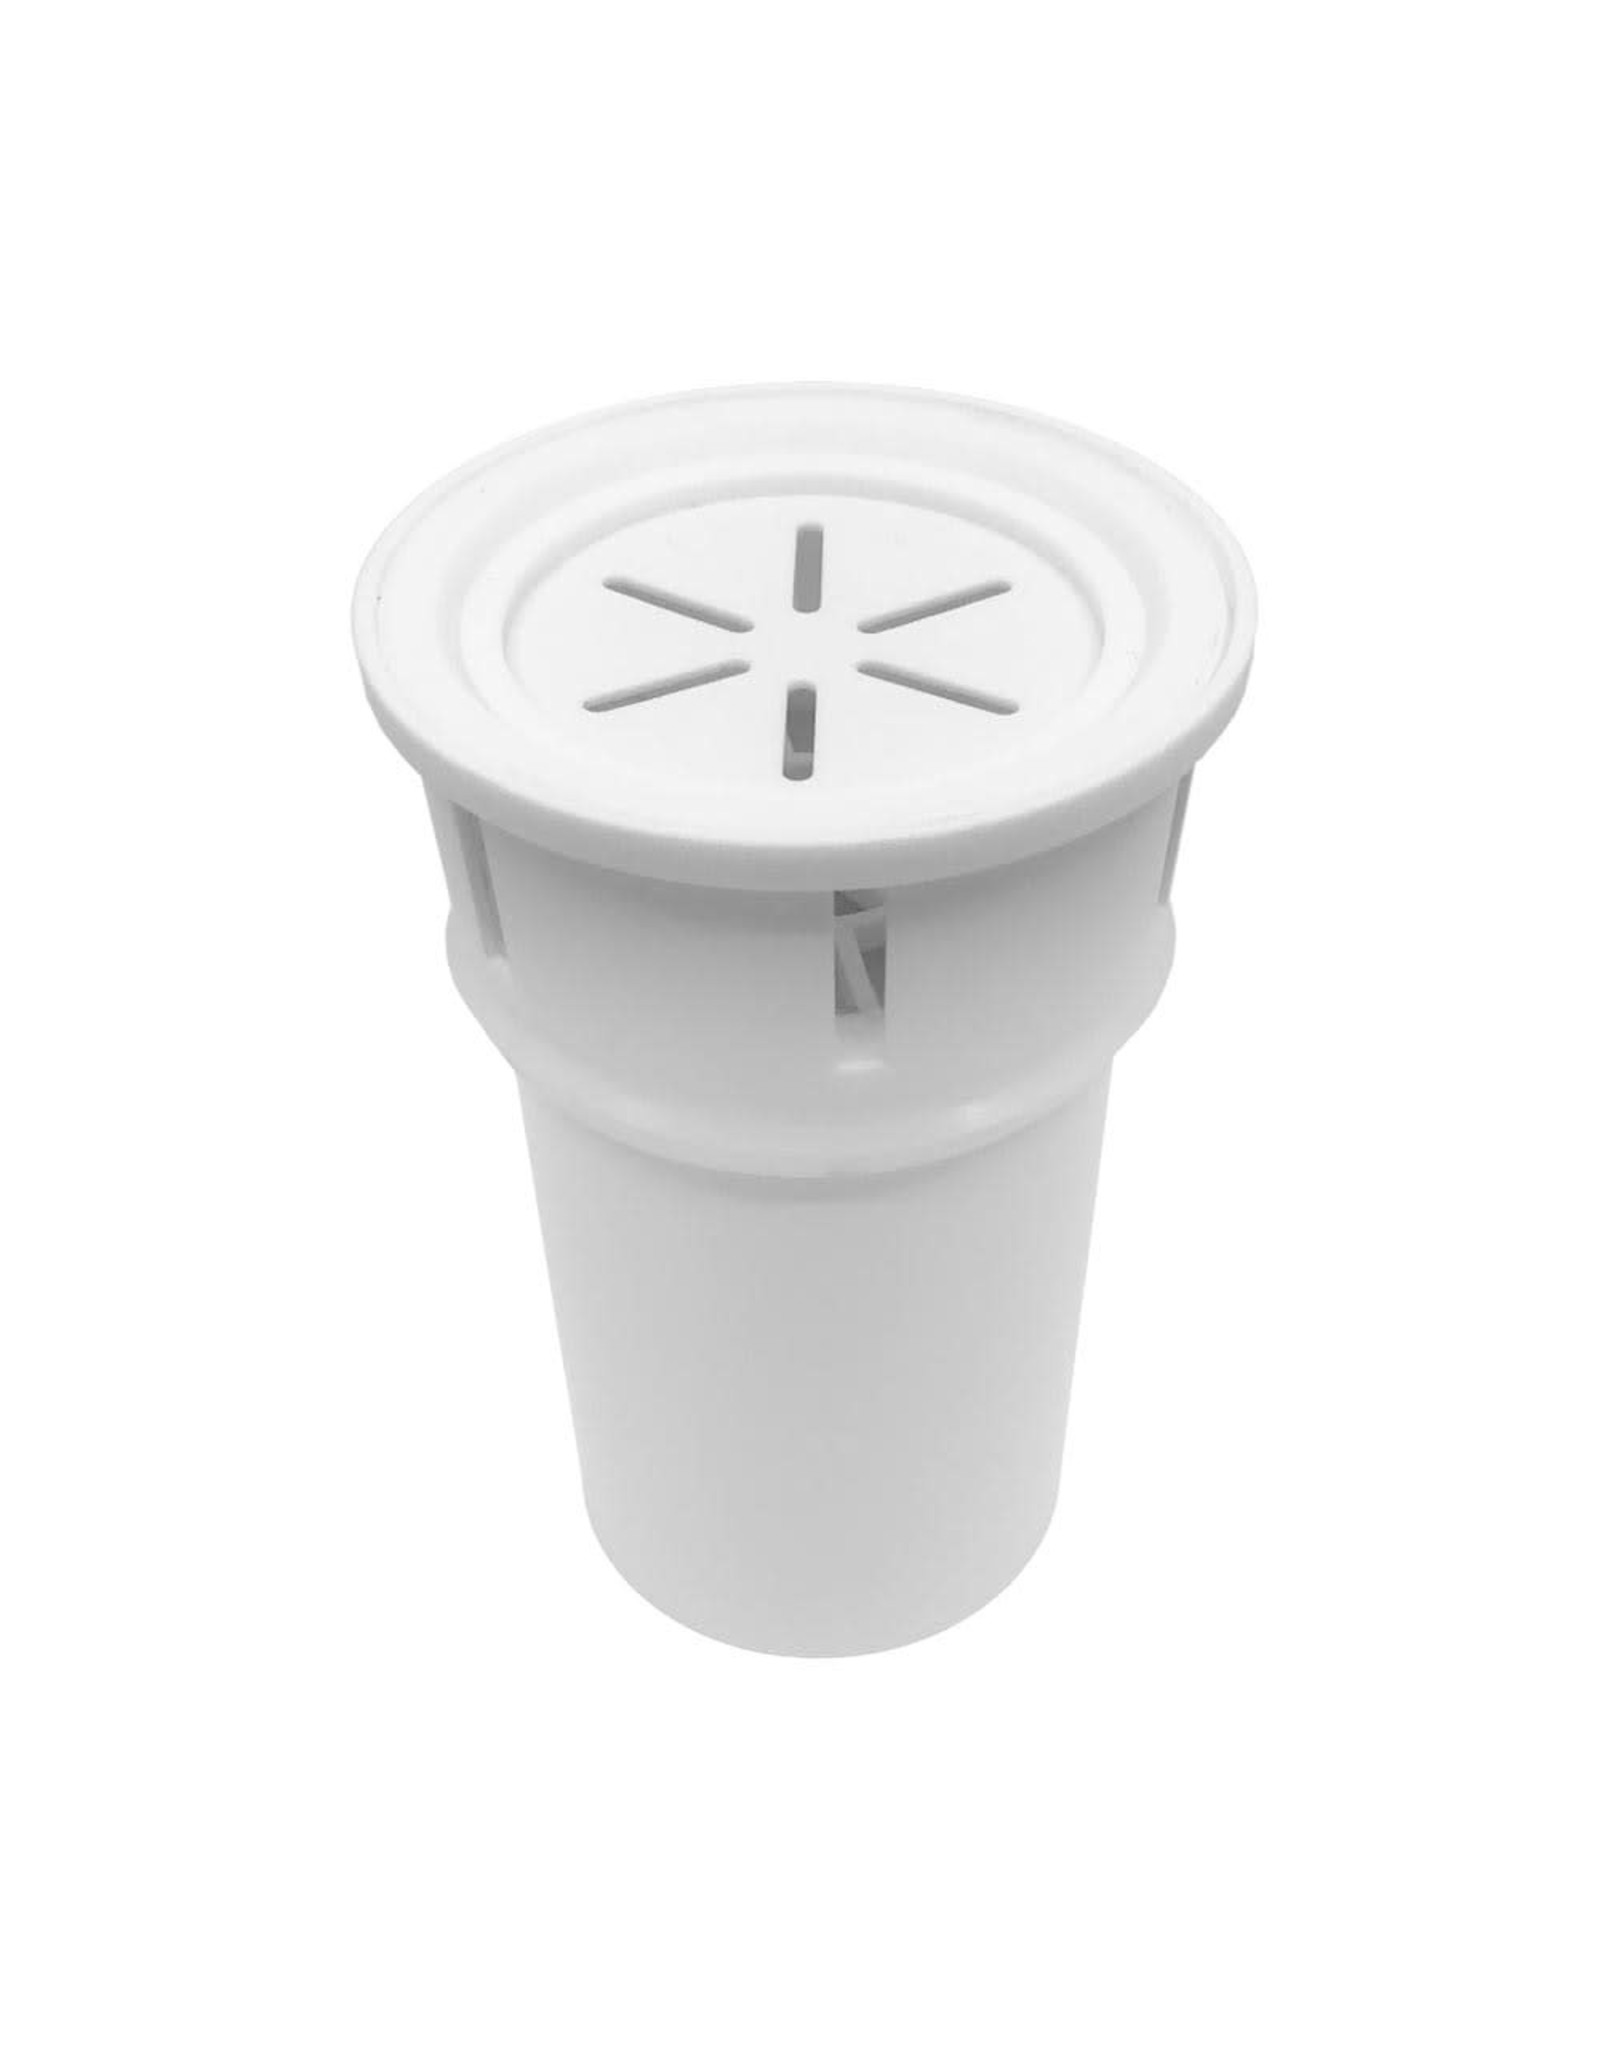 Gentoo Replacement Filter For Ecobud Gentoo